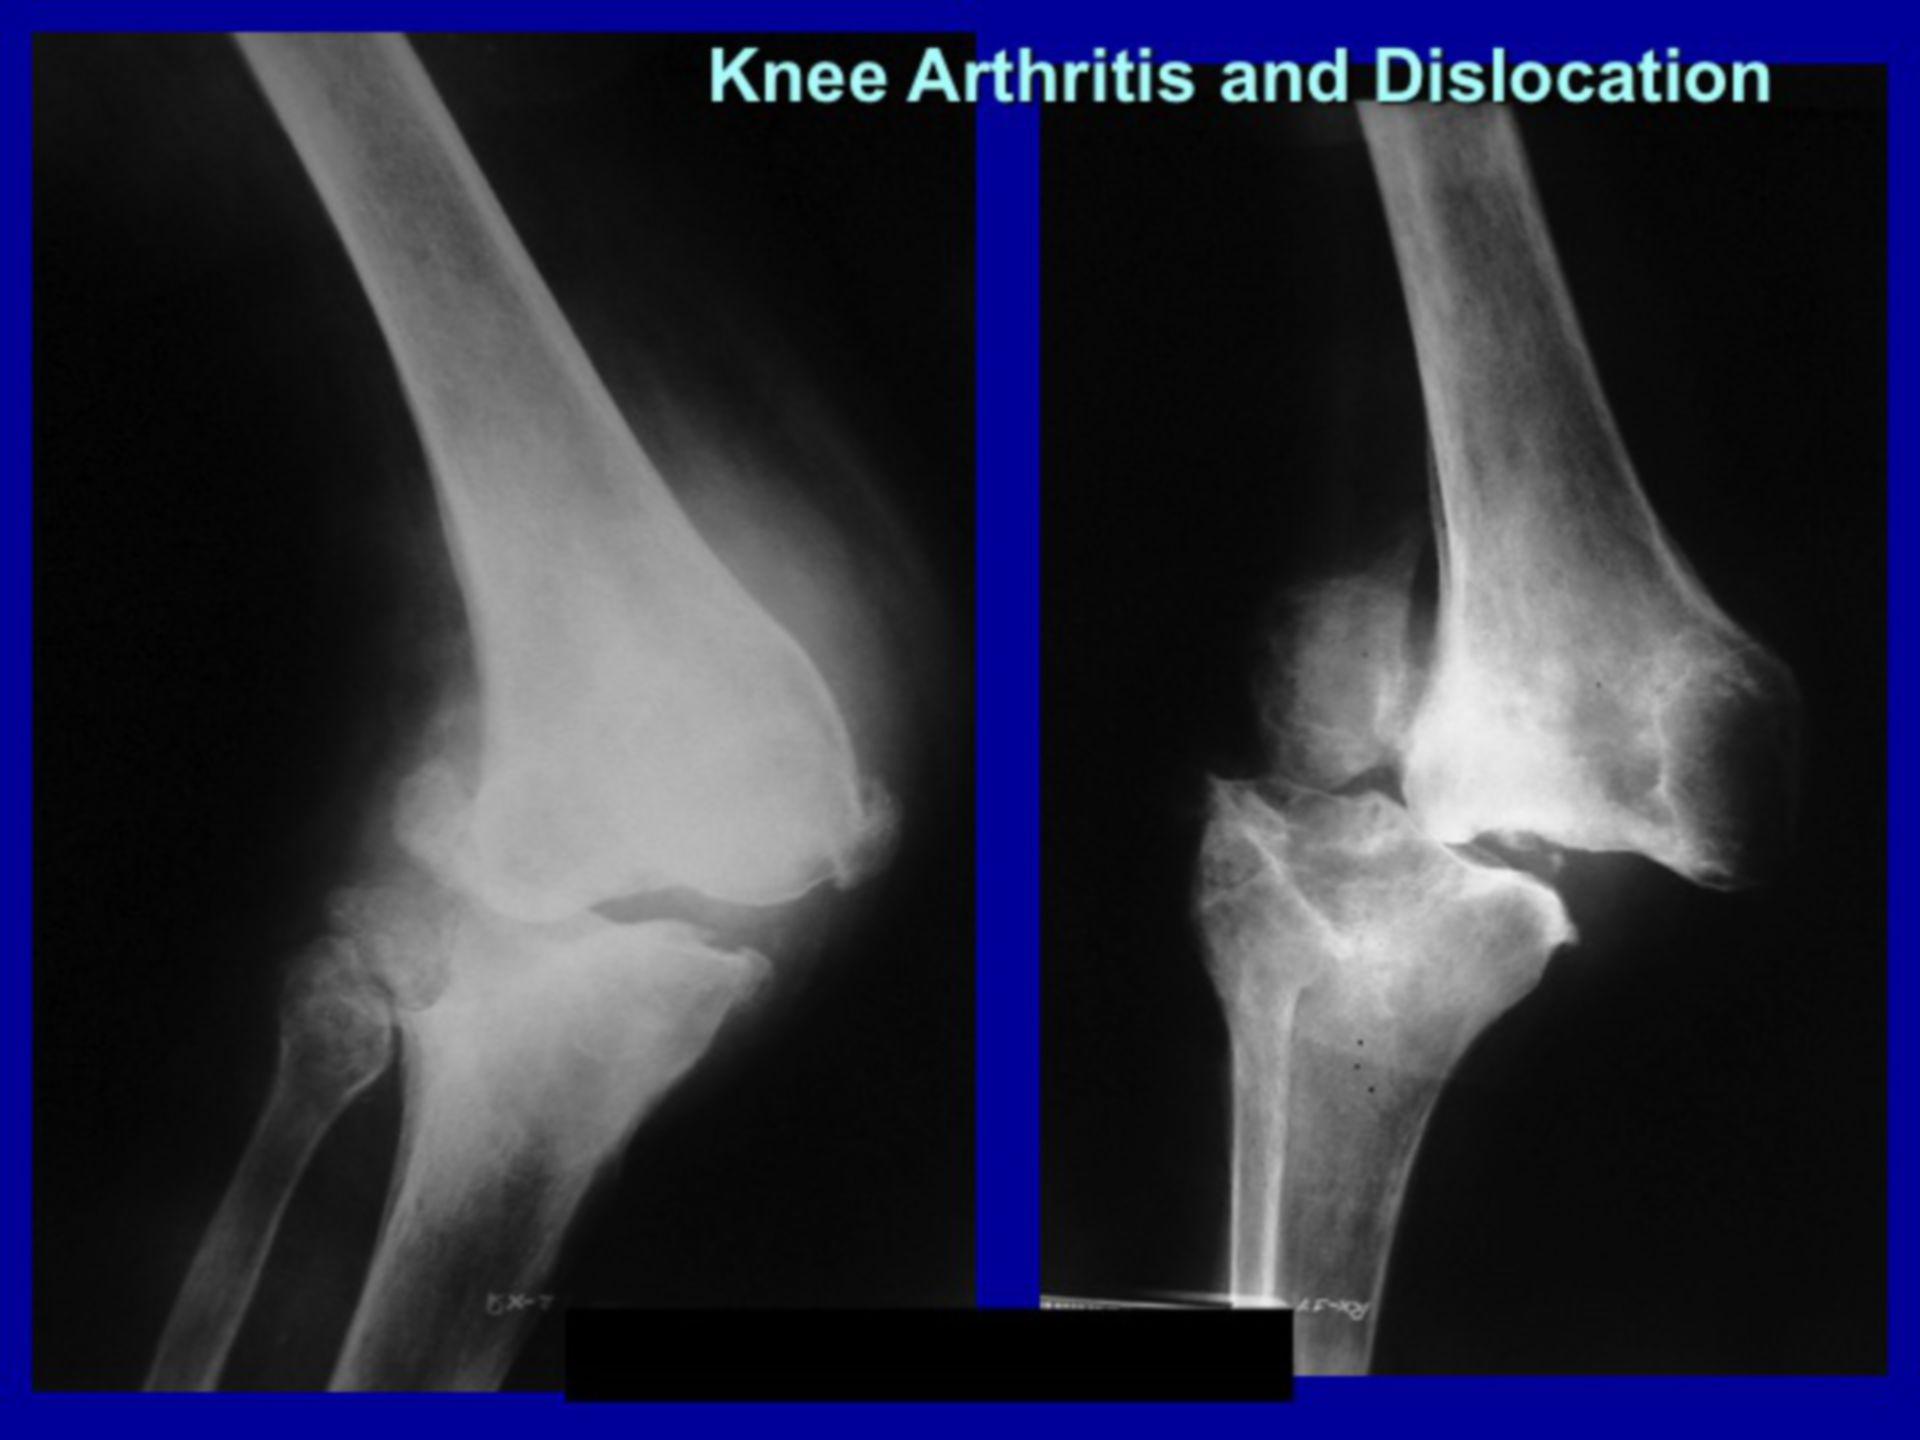 Arthritis Kniegelenk - Arthroplastik